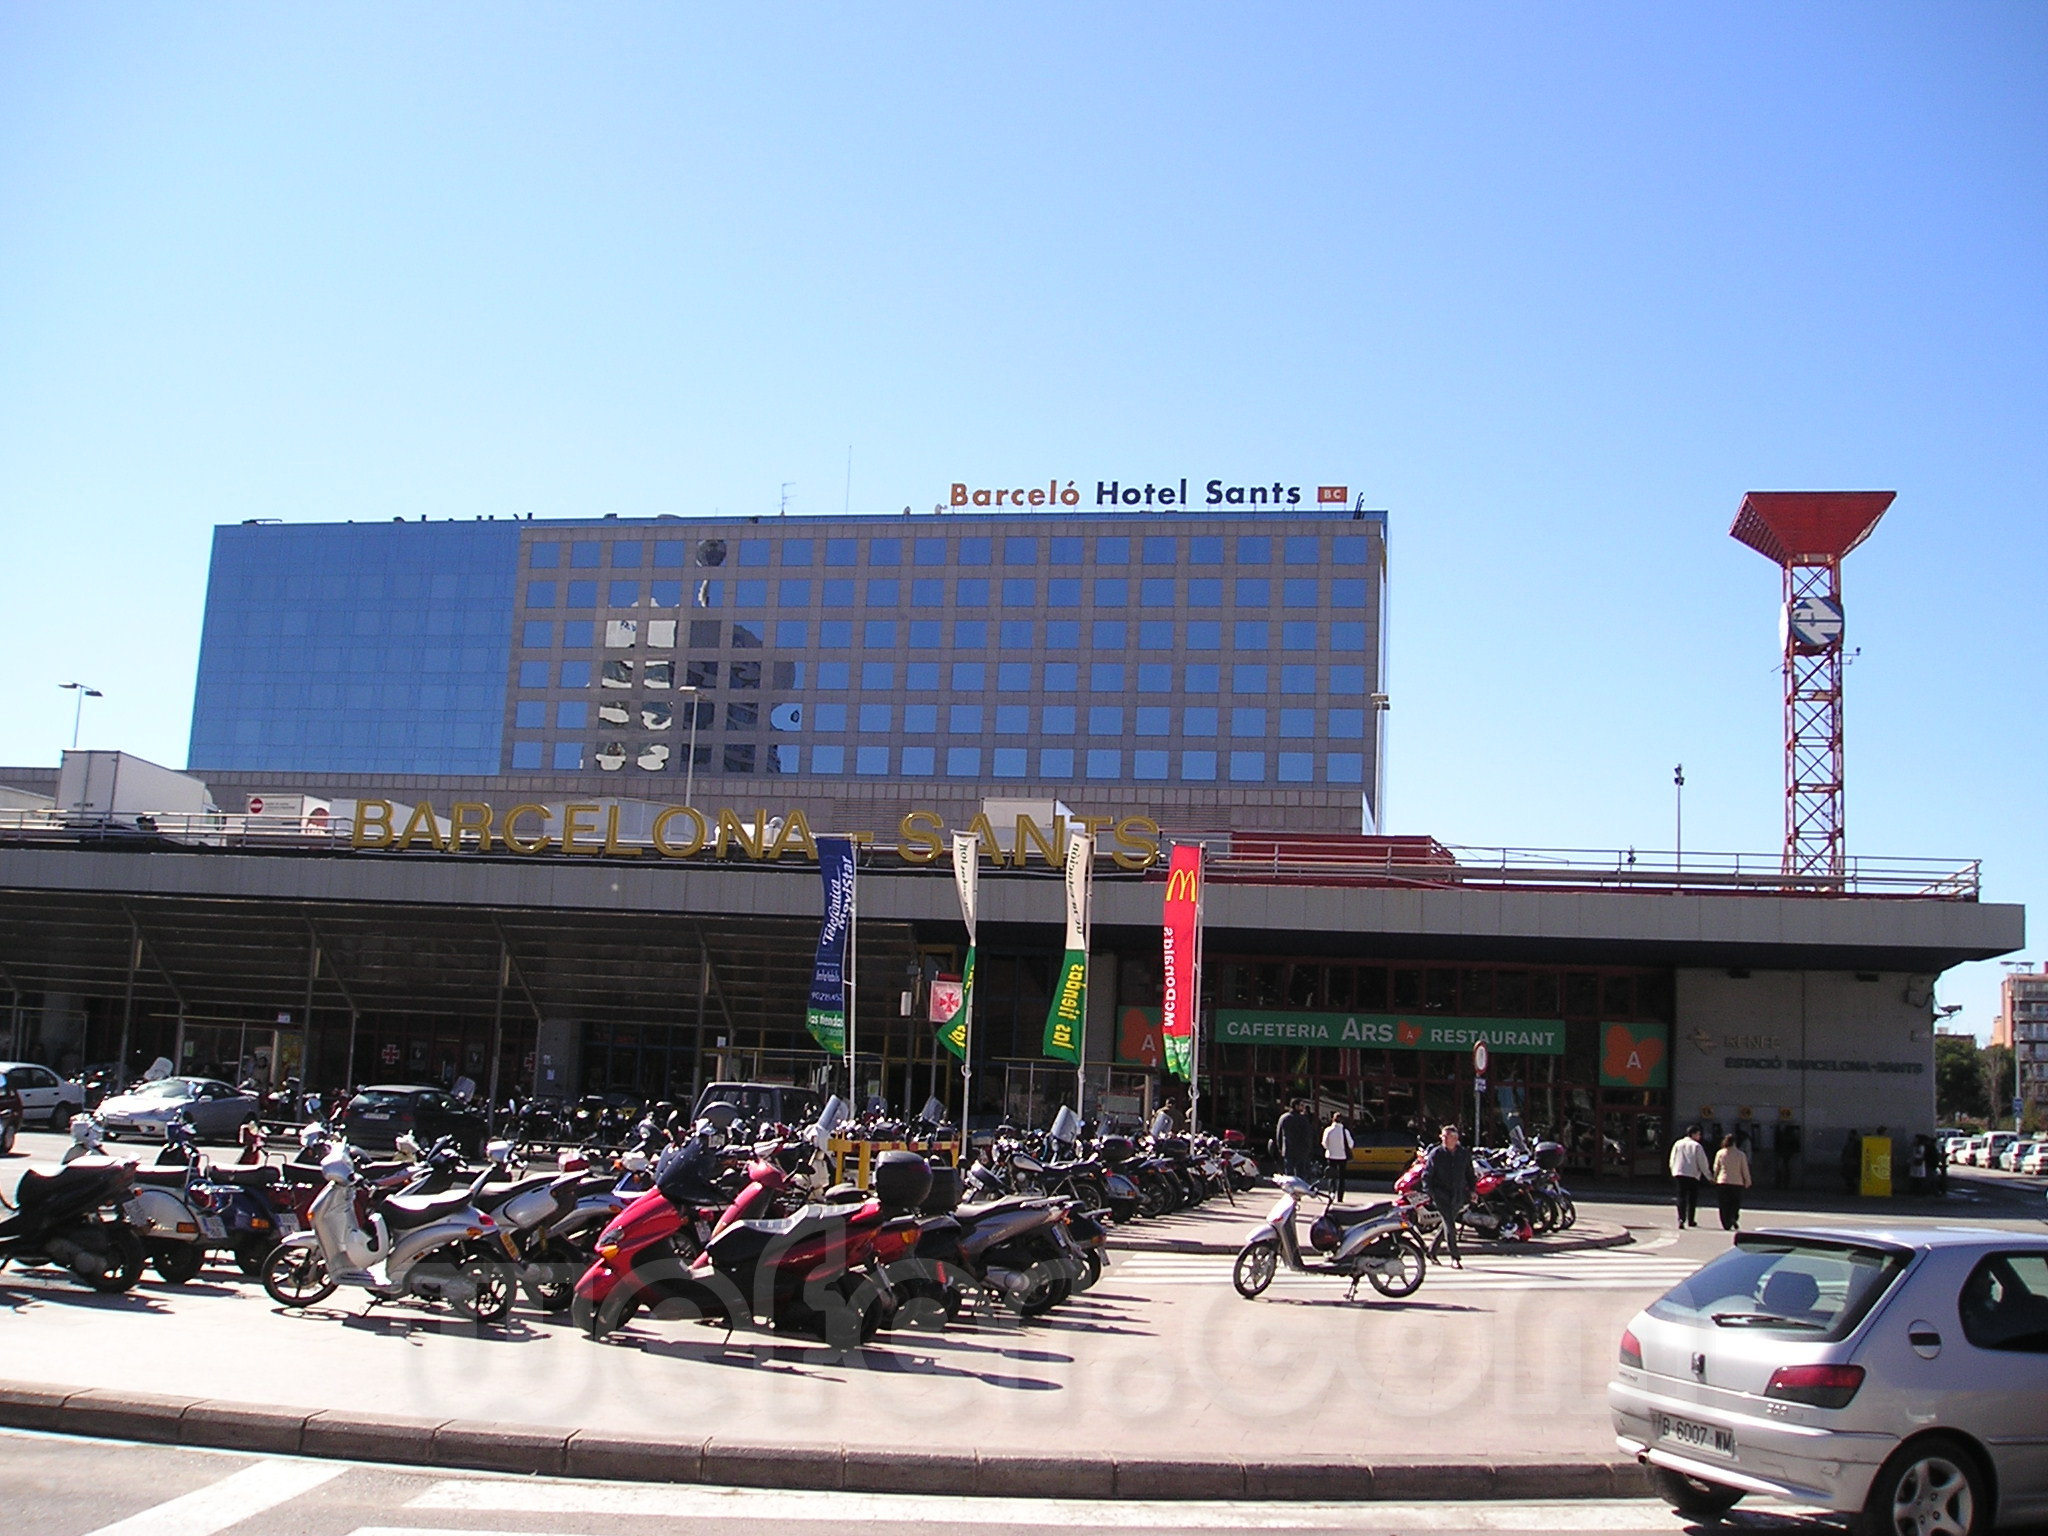 Renfe / ADIF: Barcelona - Sants